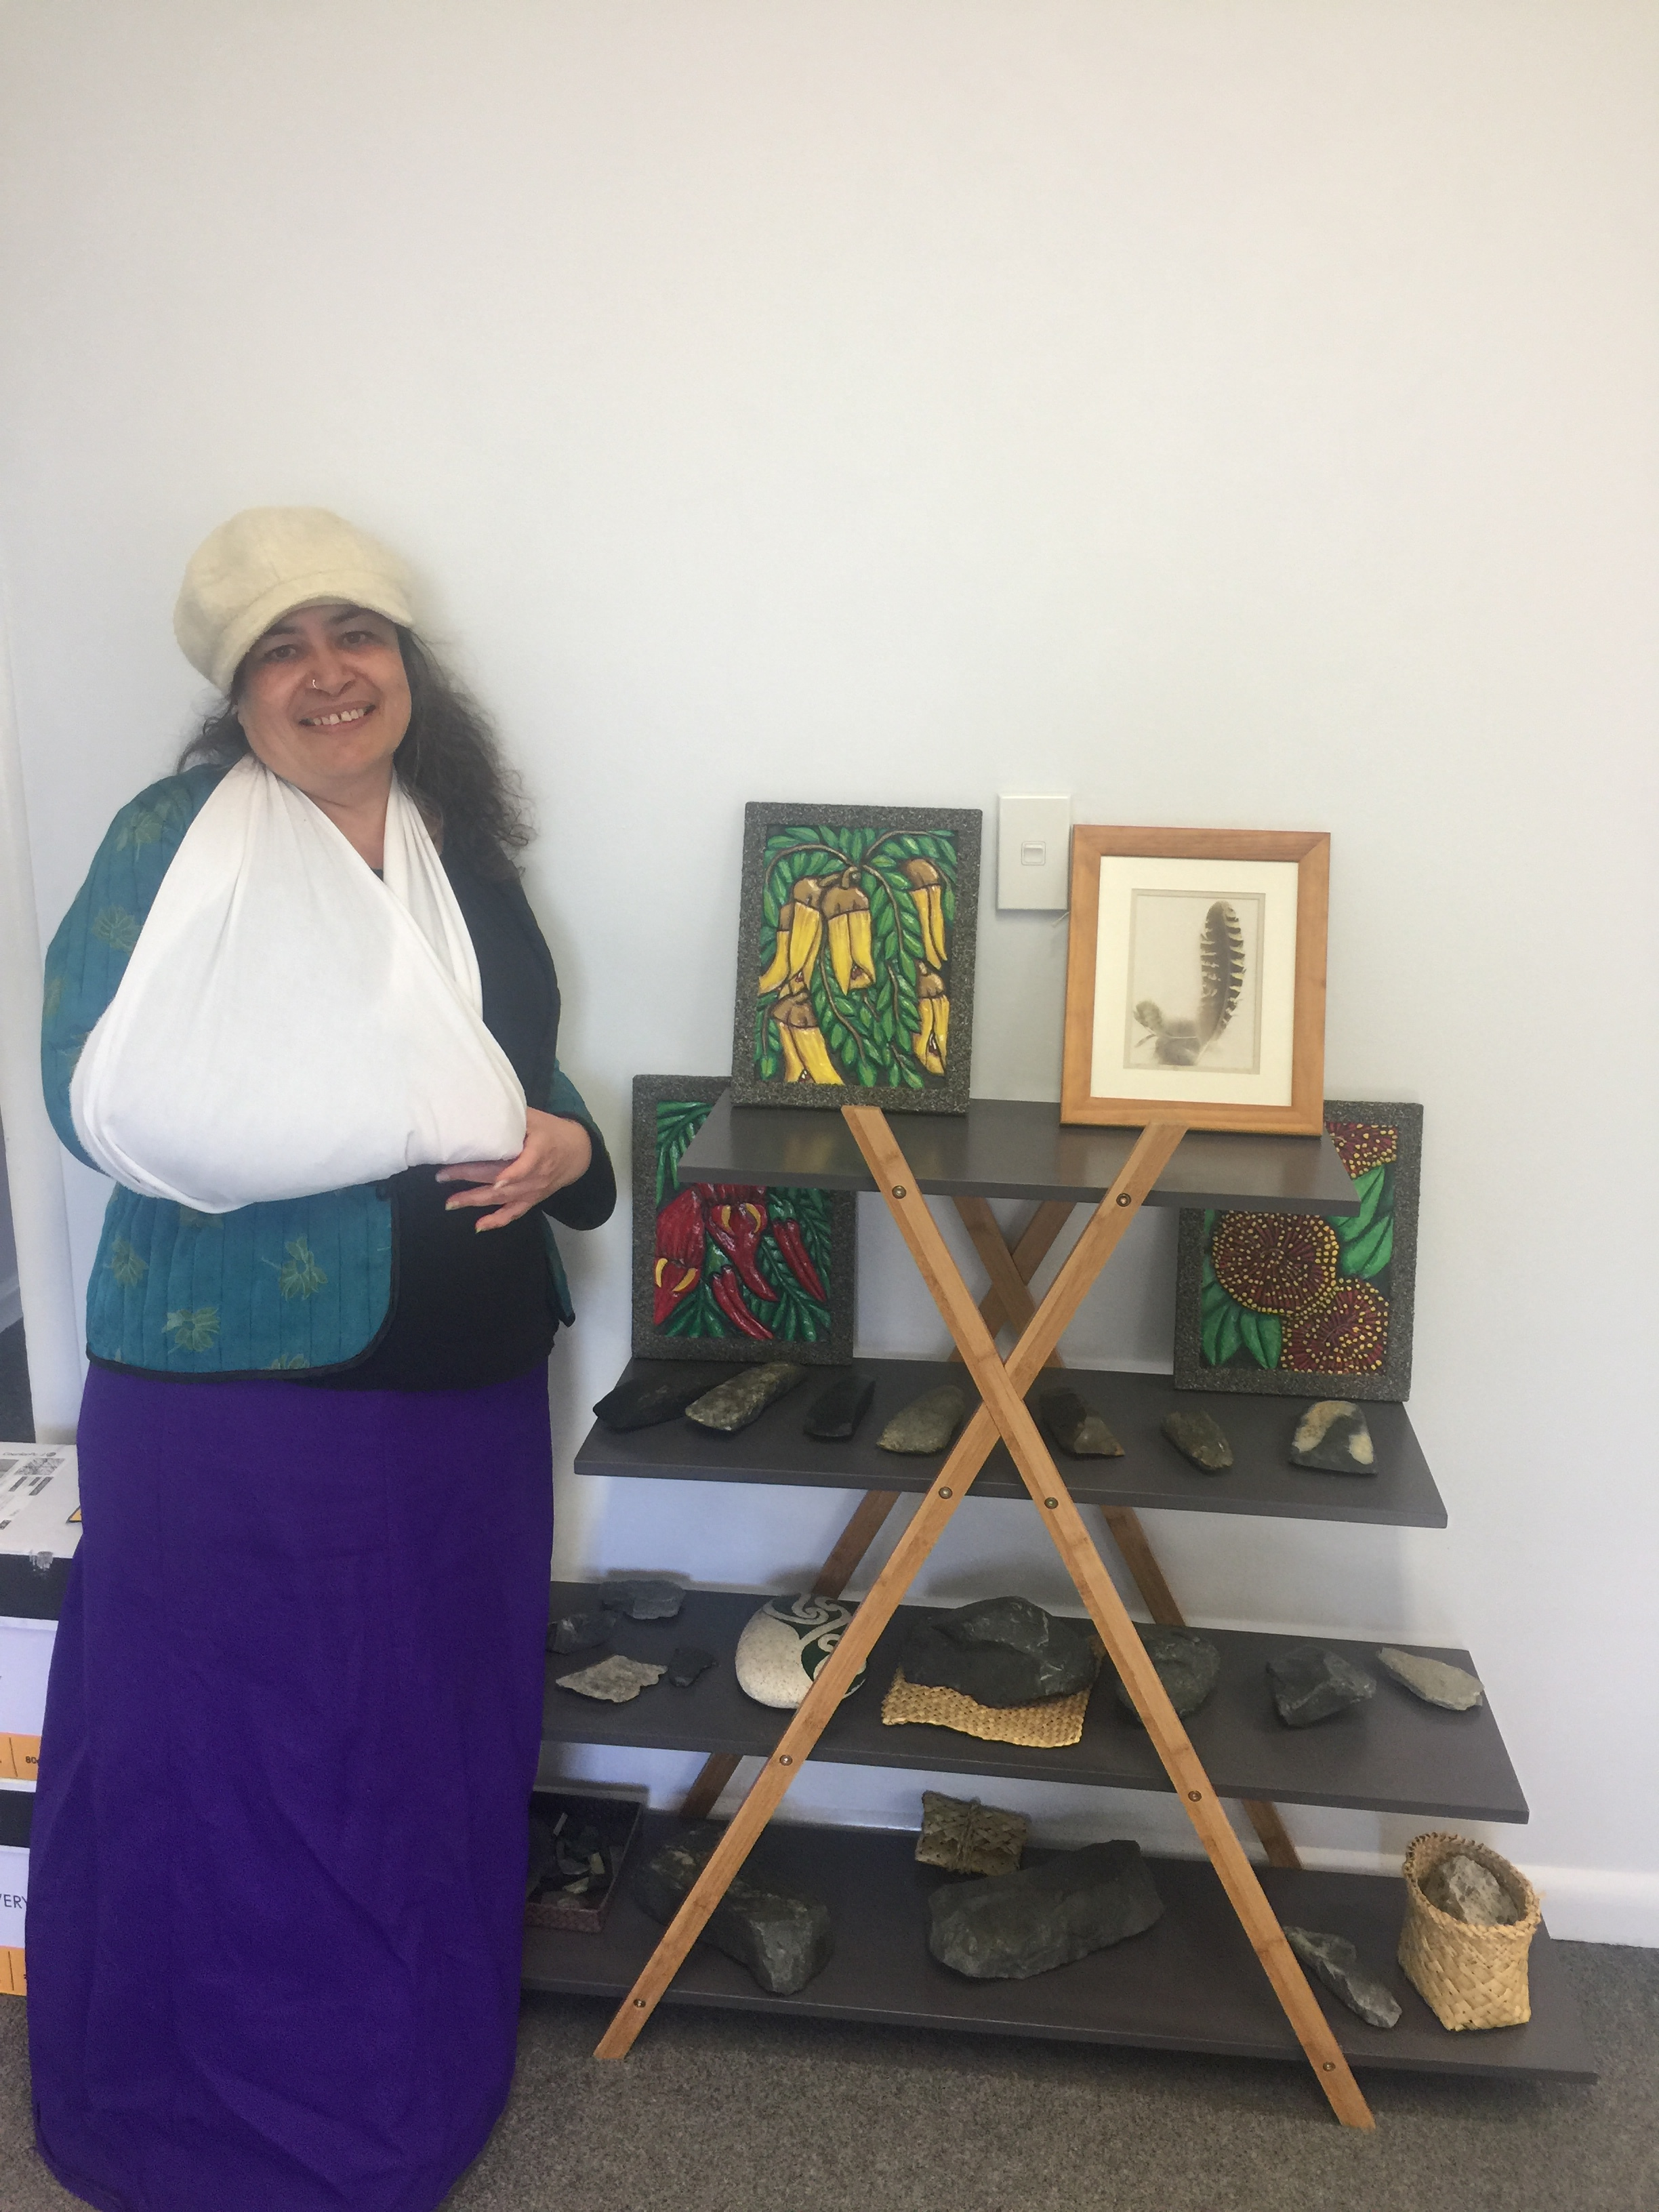 Noel Hemi with some of her artwork